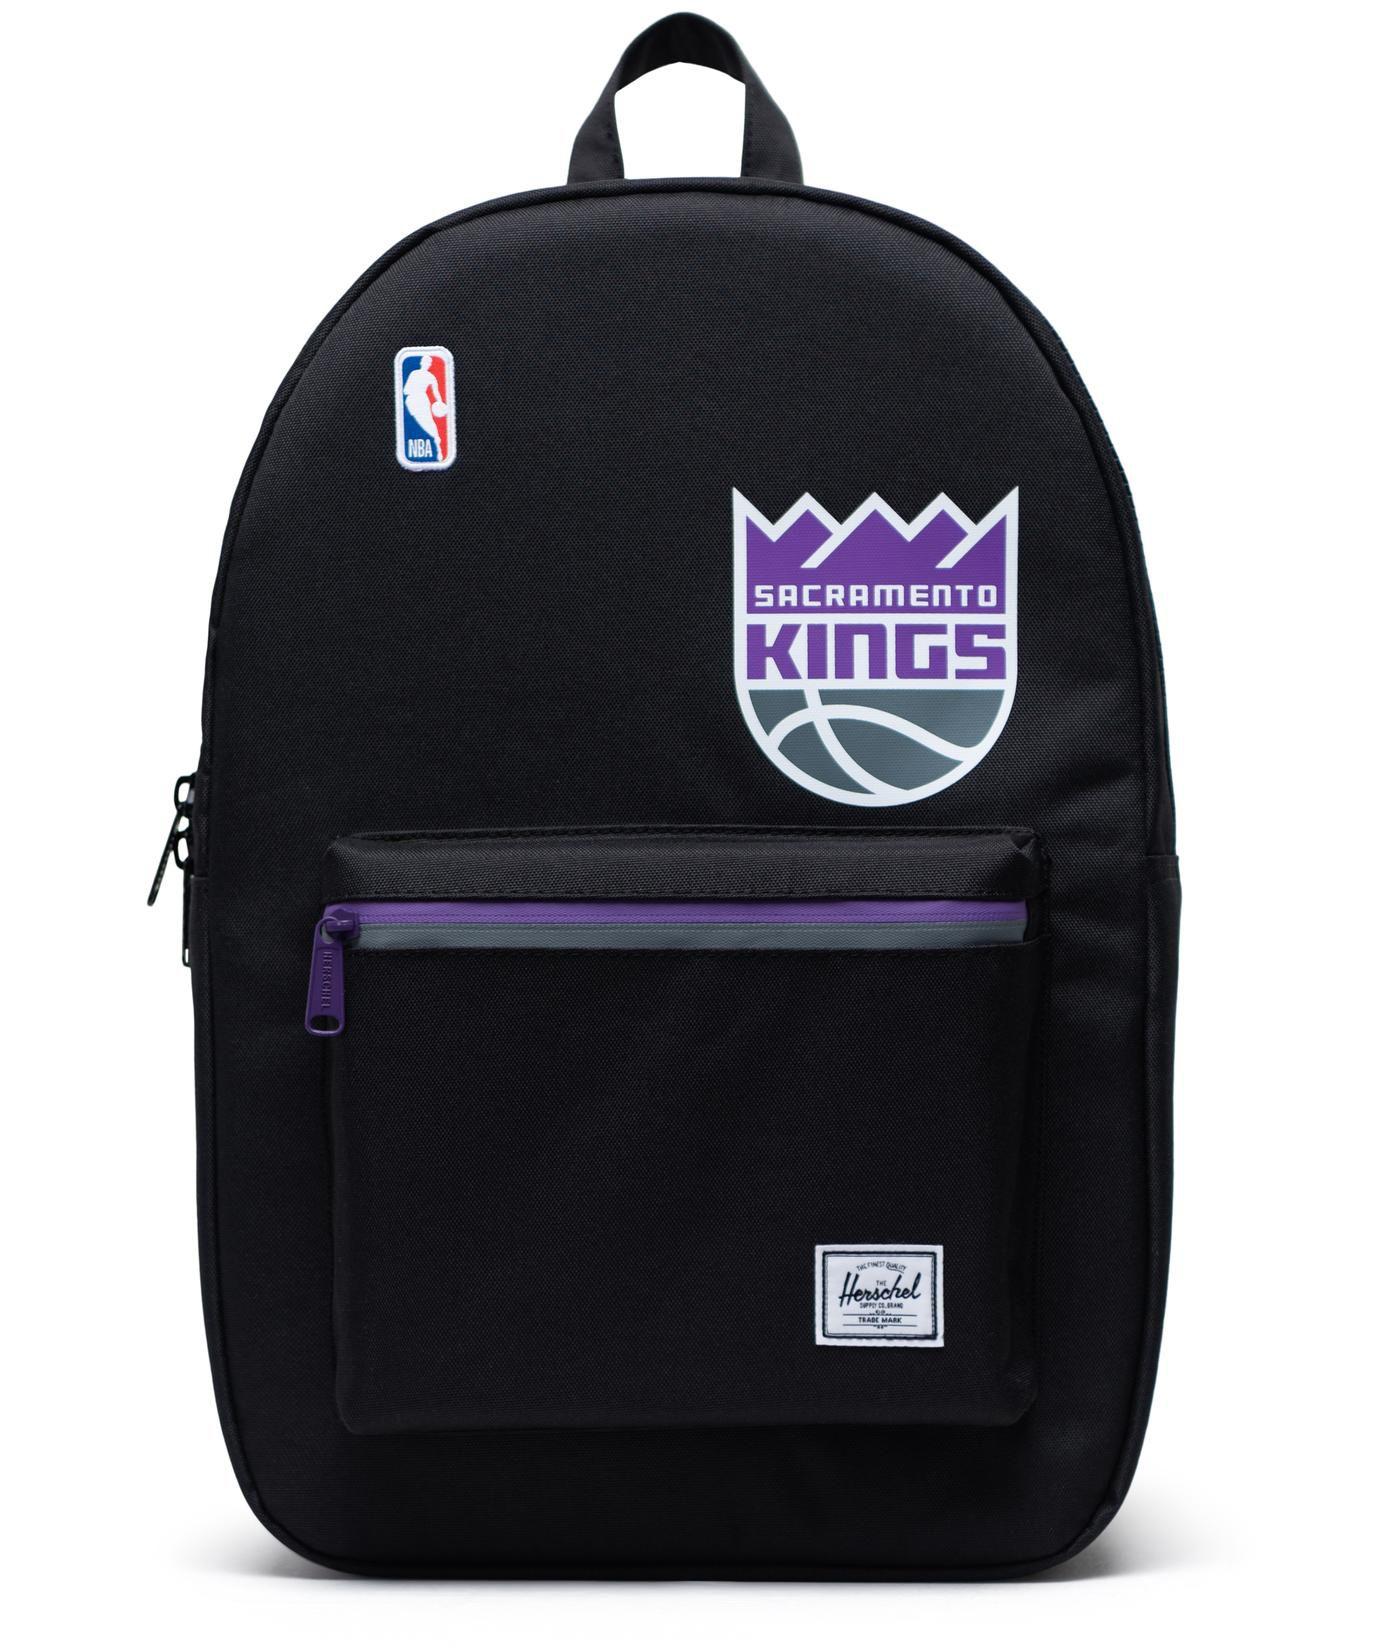 Herschel Sacramento Kings Black Settlement Backpack